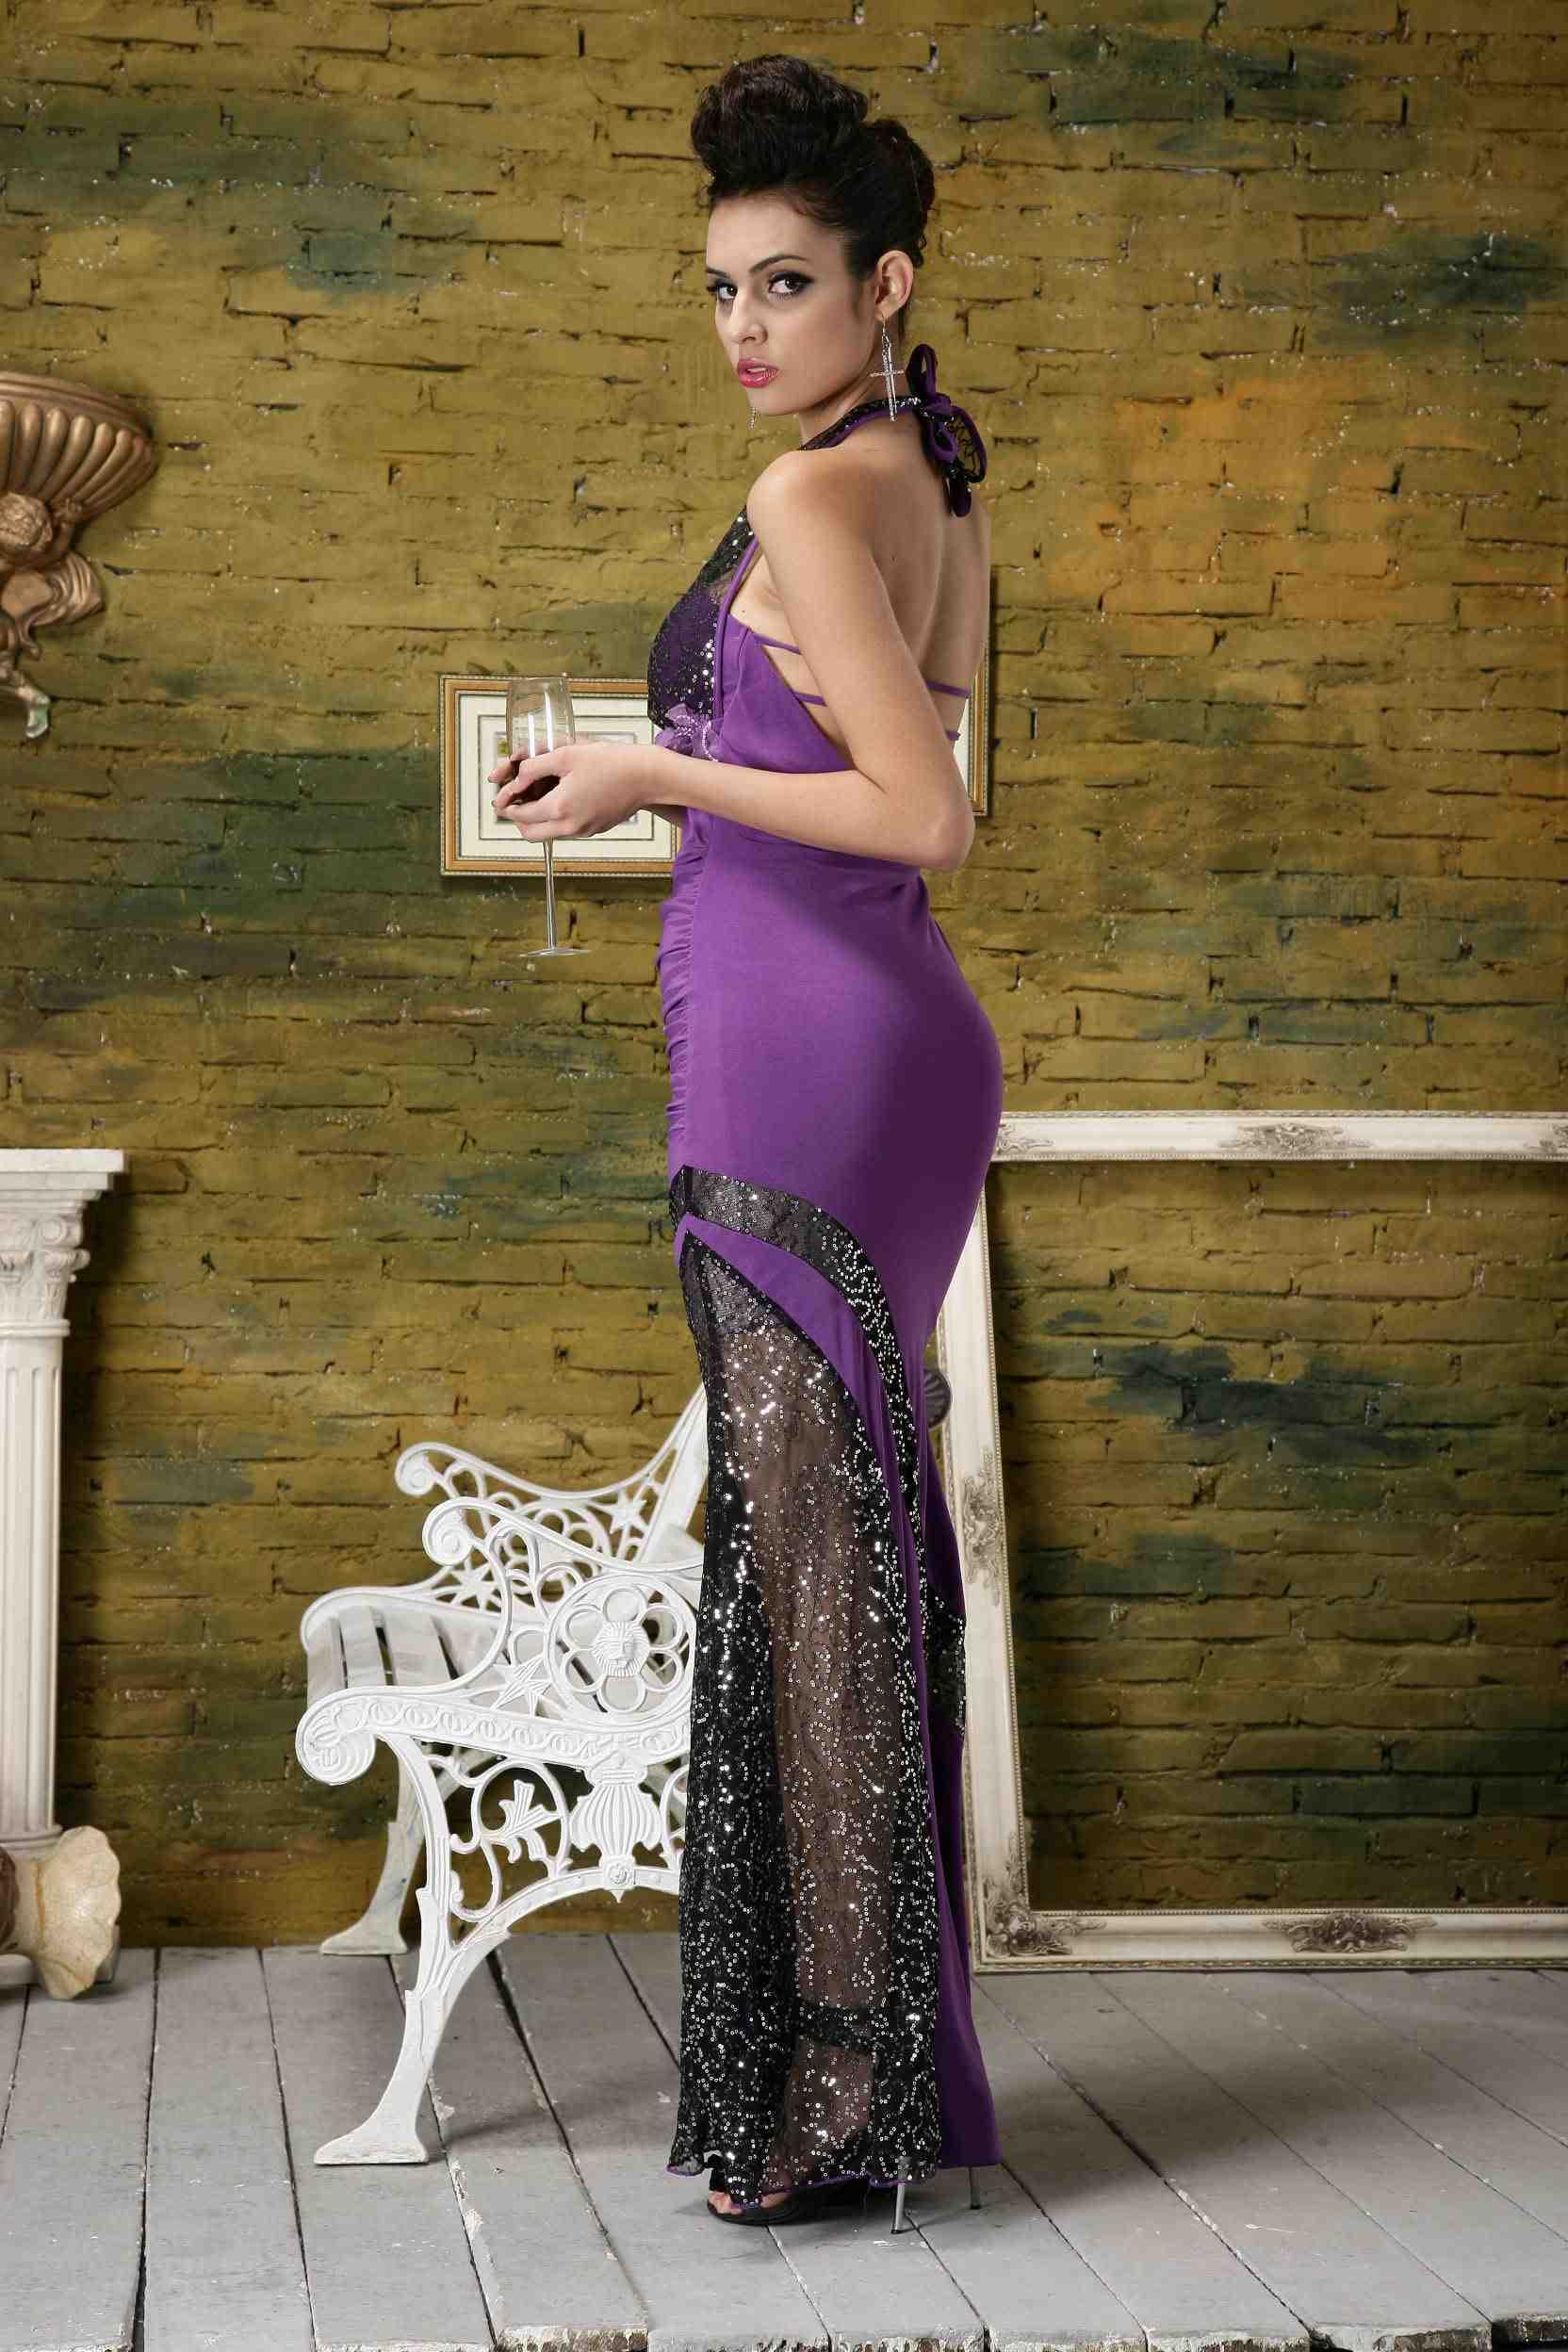 Вечернее платье Lan Kwai Fong 21314 Lan Kwai Fong 2013 года Макси-юбка (более 126см)